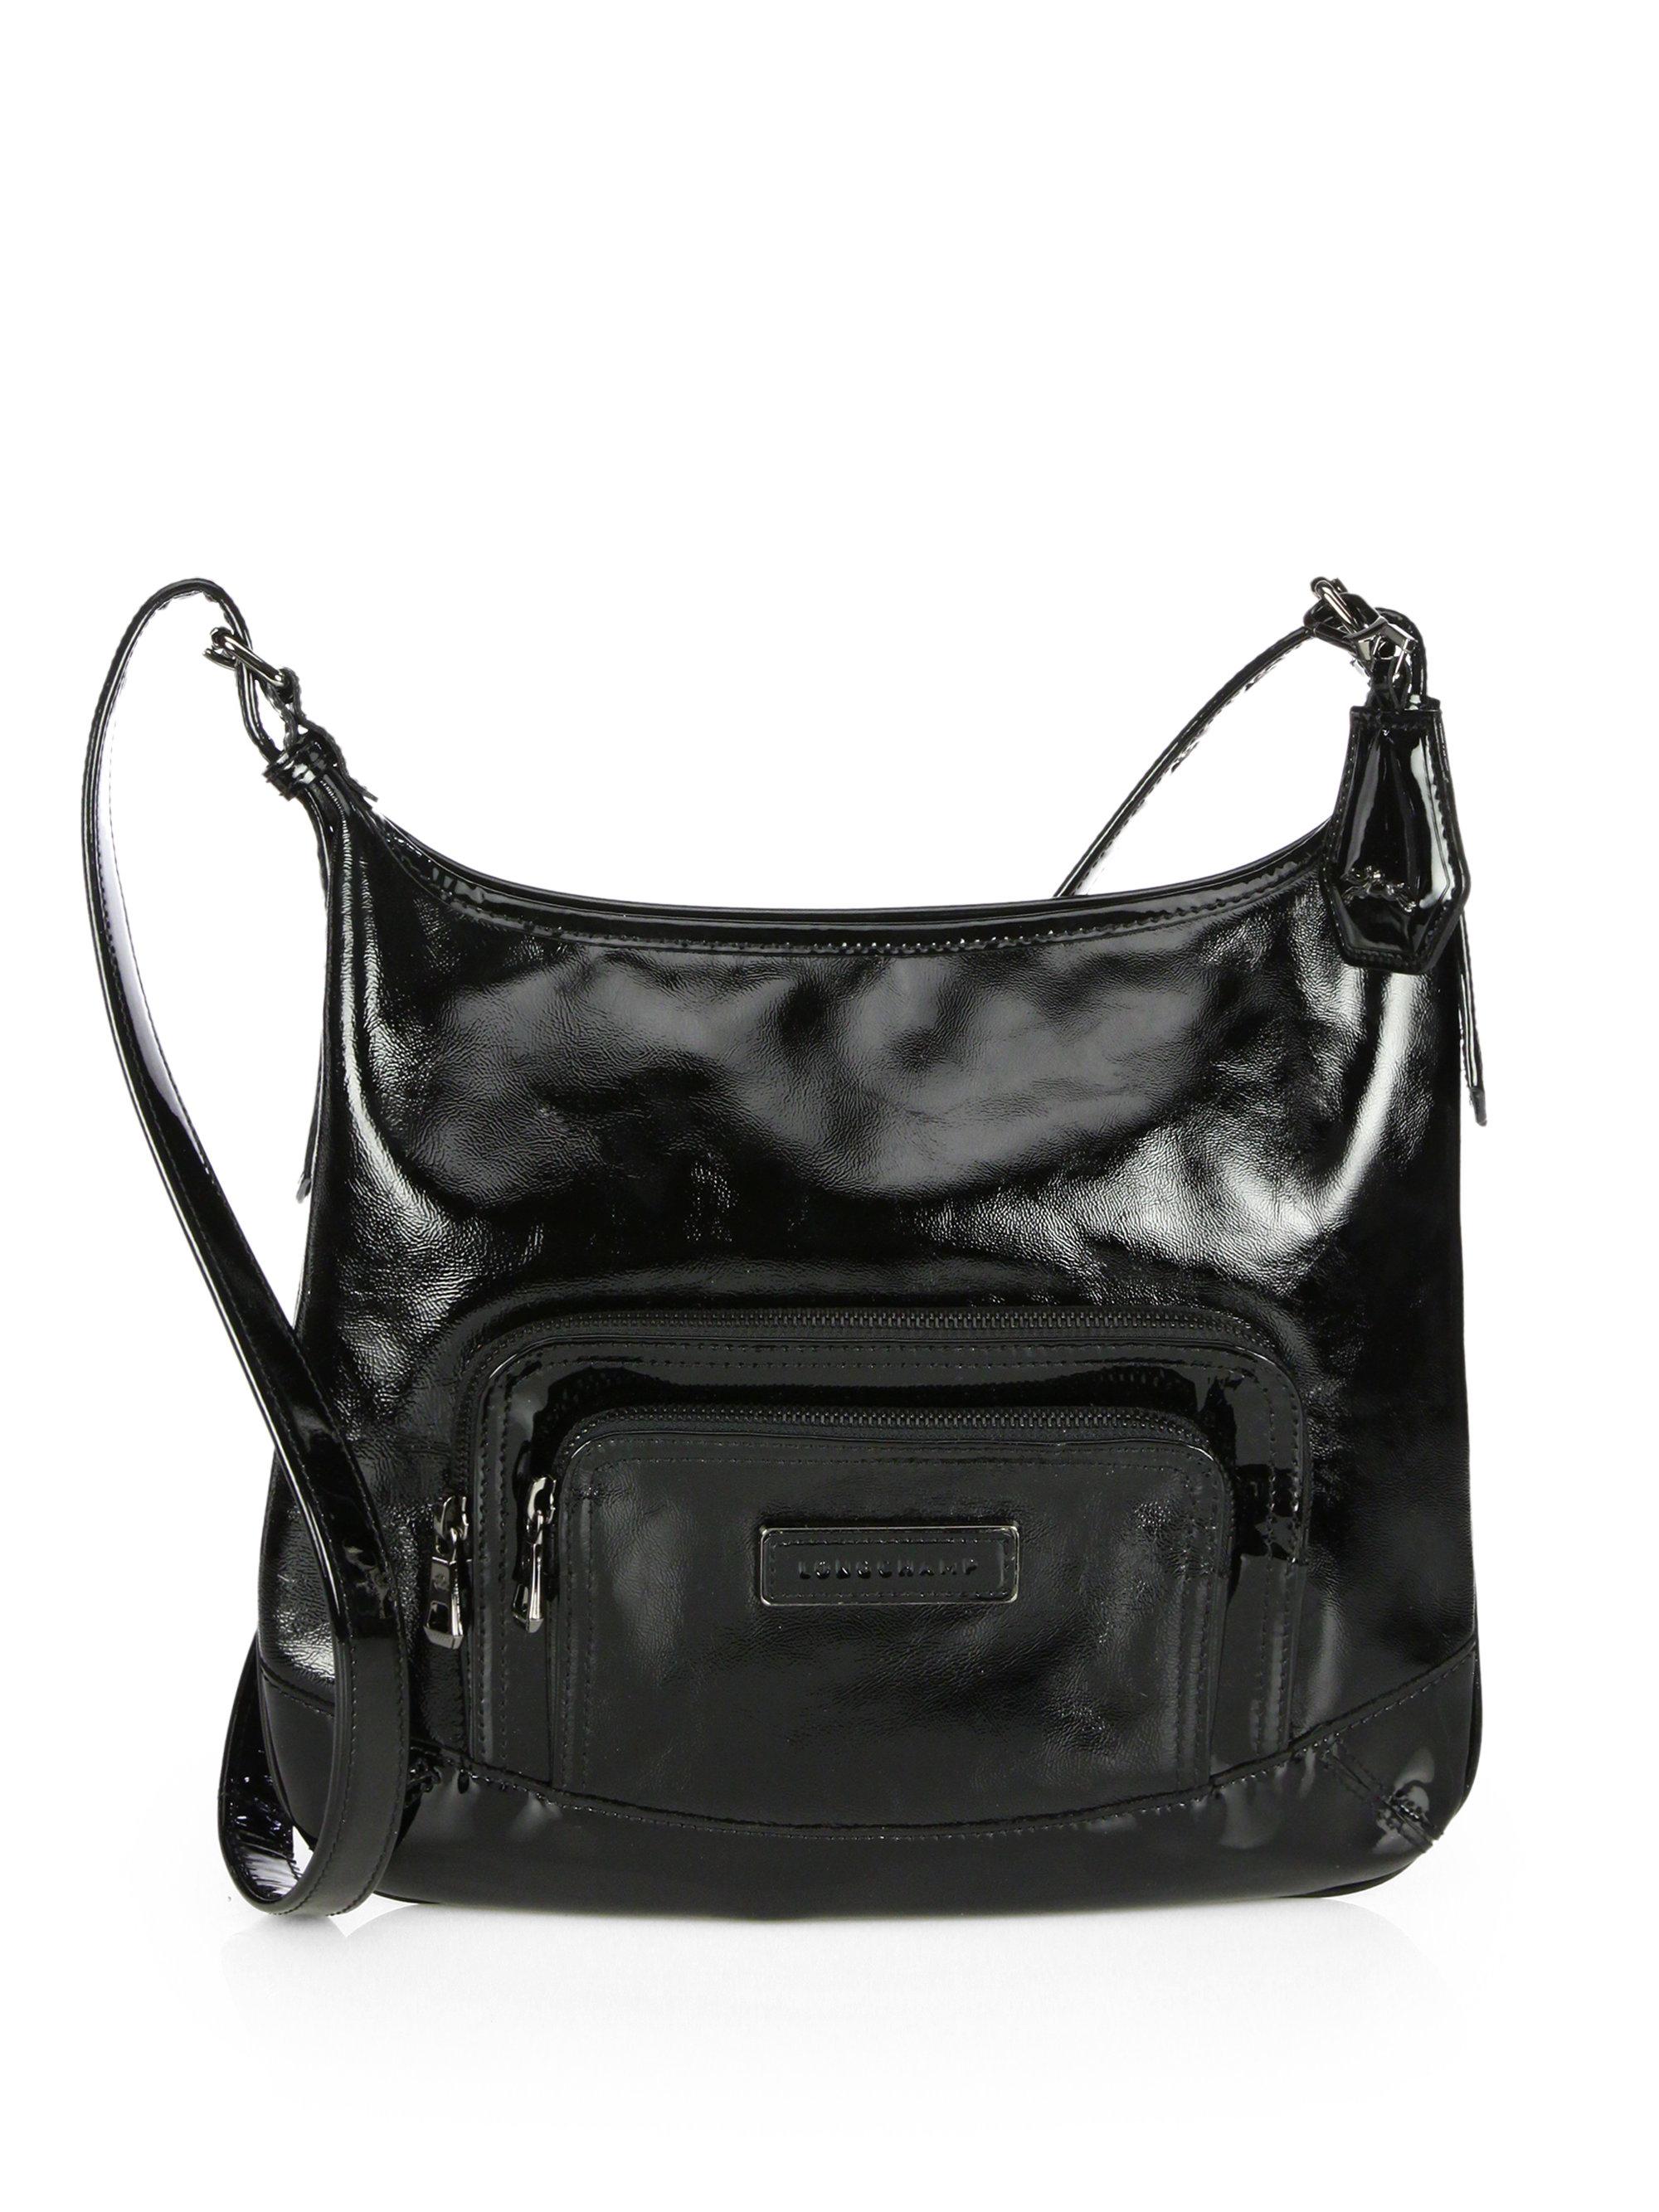 ce5003322e66 Lyst - Longchamp Legende Verni Patent Leather Crossbody Bag in Black